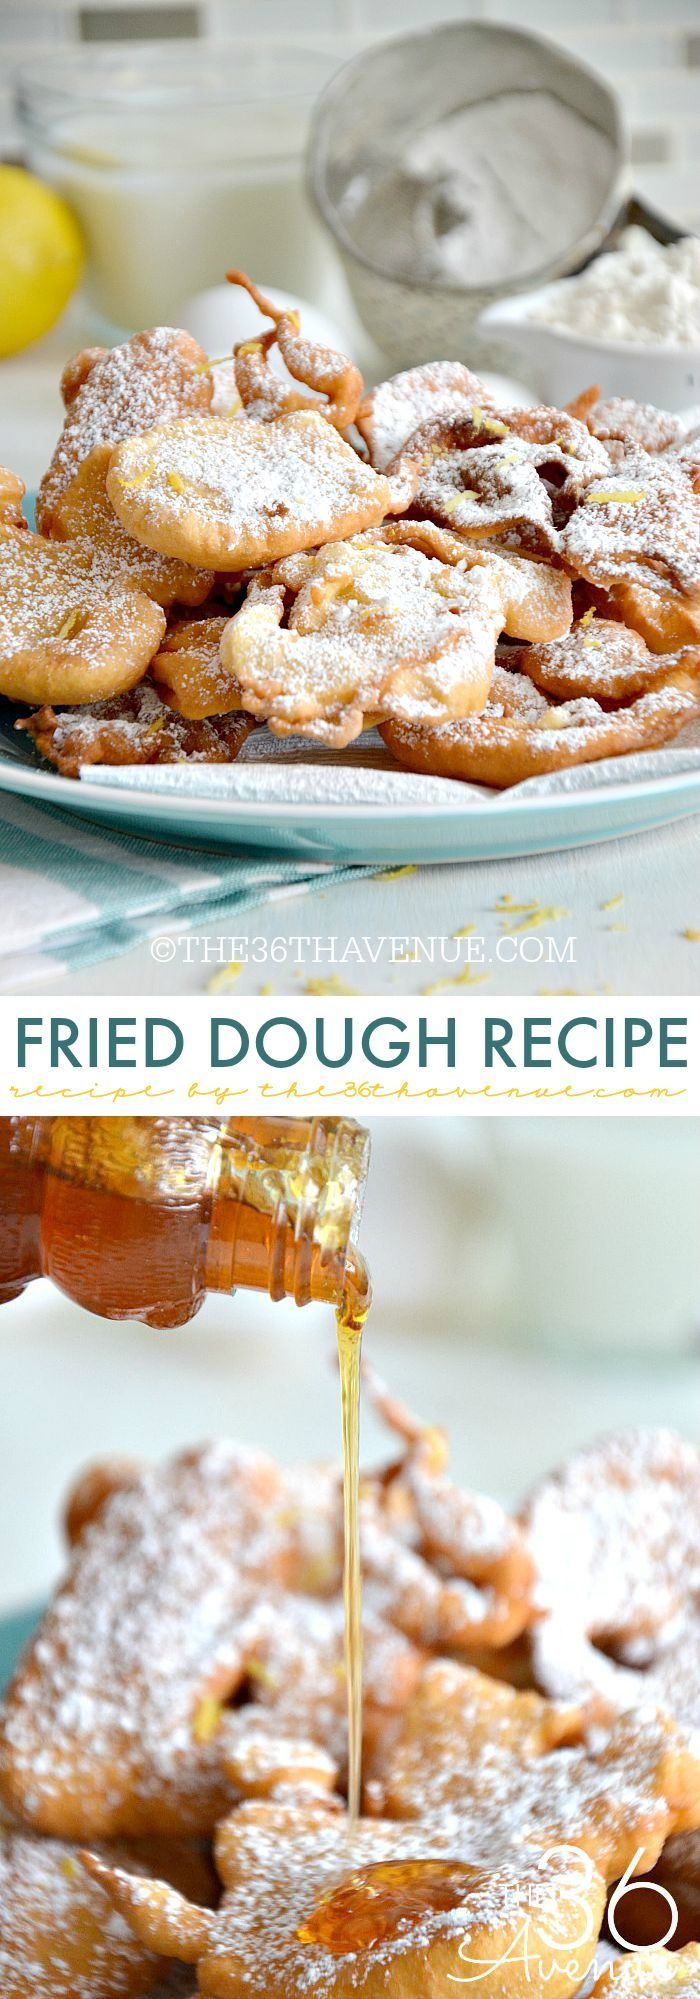 Recipe - Fried Dough Recipe... Such a yummy treat! Read more here http://www.the36thavenue.com/fried-dough-recipe/ 